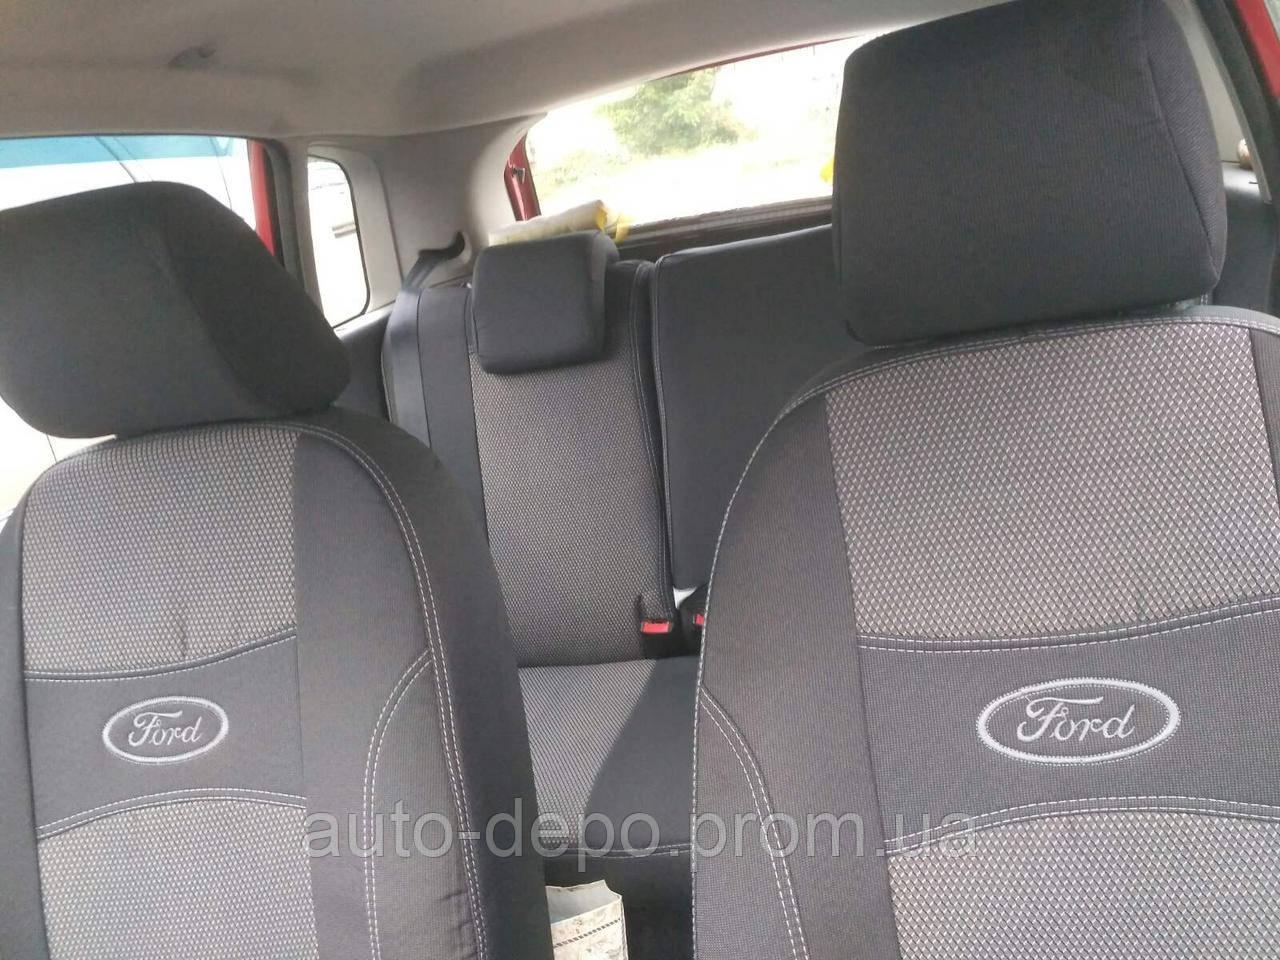 Чехлы на Форд Фиеста, Ford Fiesta MК 6 2002-2008 Nika